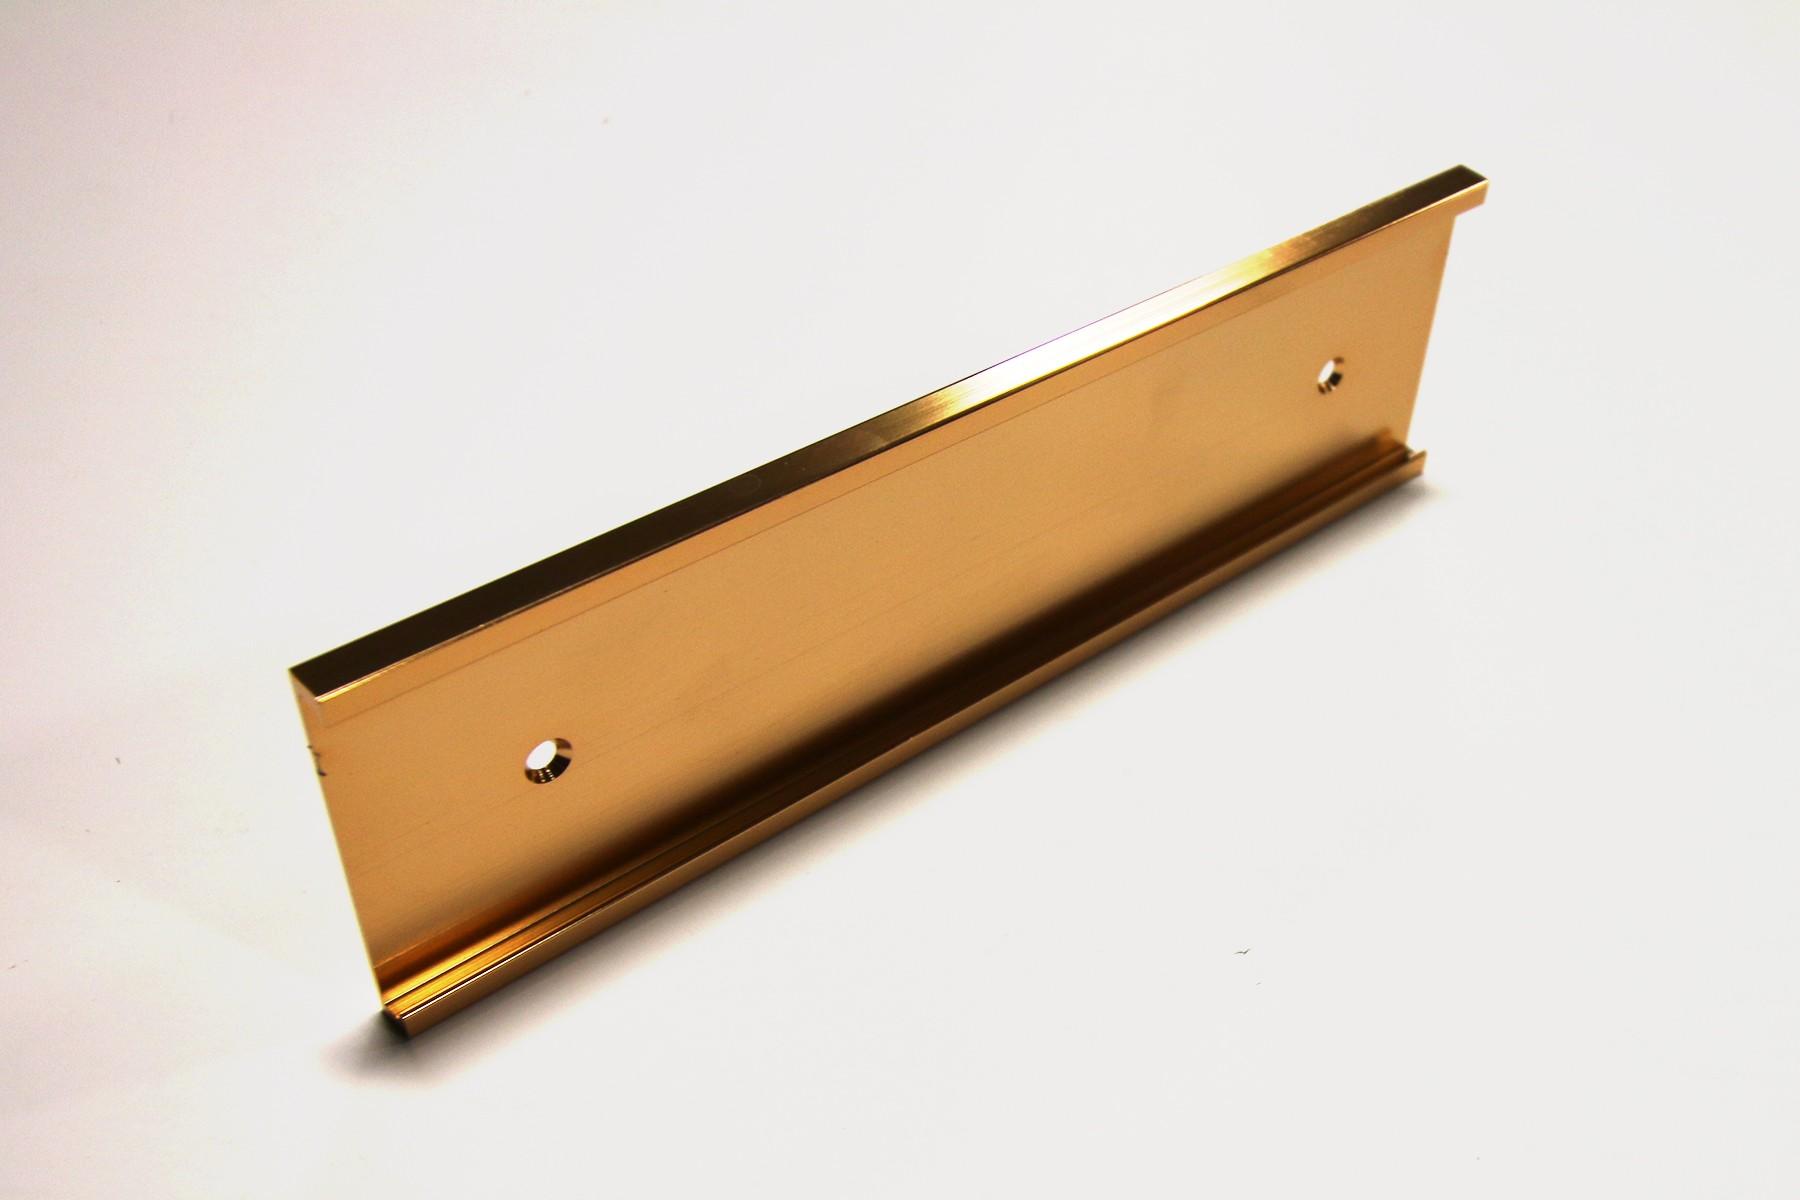 2 x 10 Wall Bracket (1/8), Gold